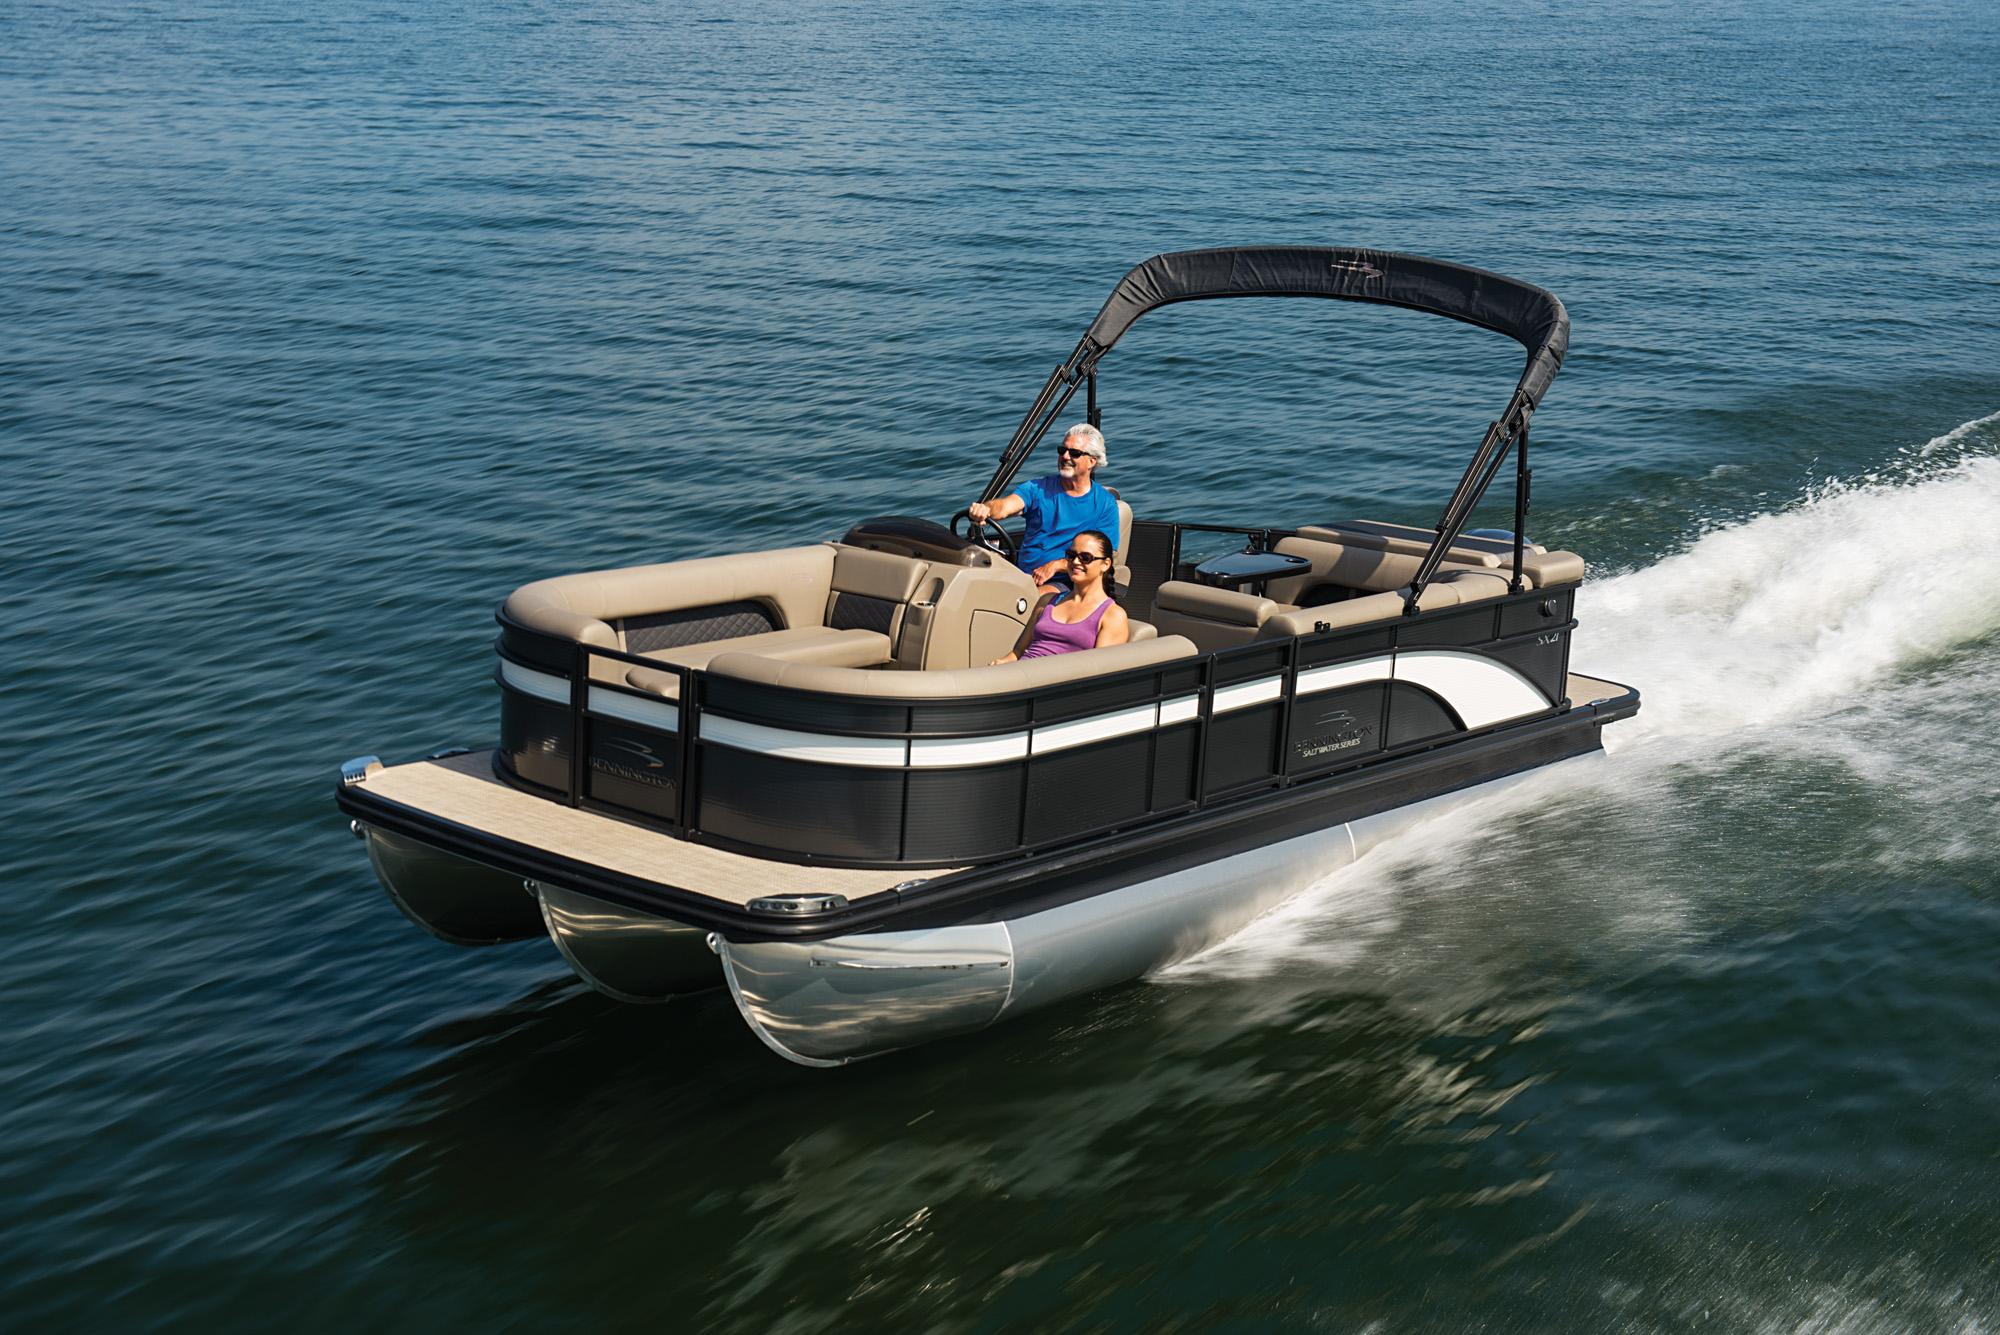 2018 Boat Buyers Guide Bennington 21 Slx Premium Boating